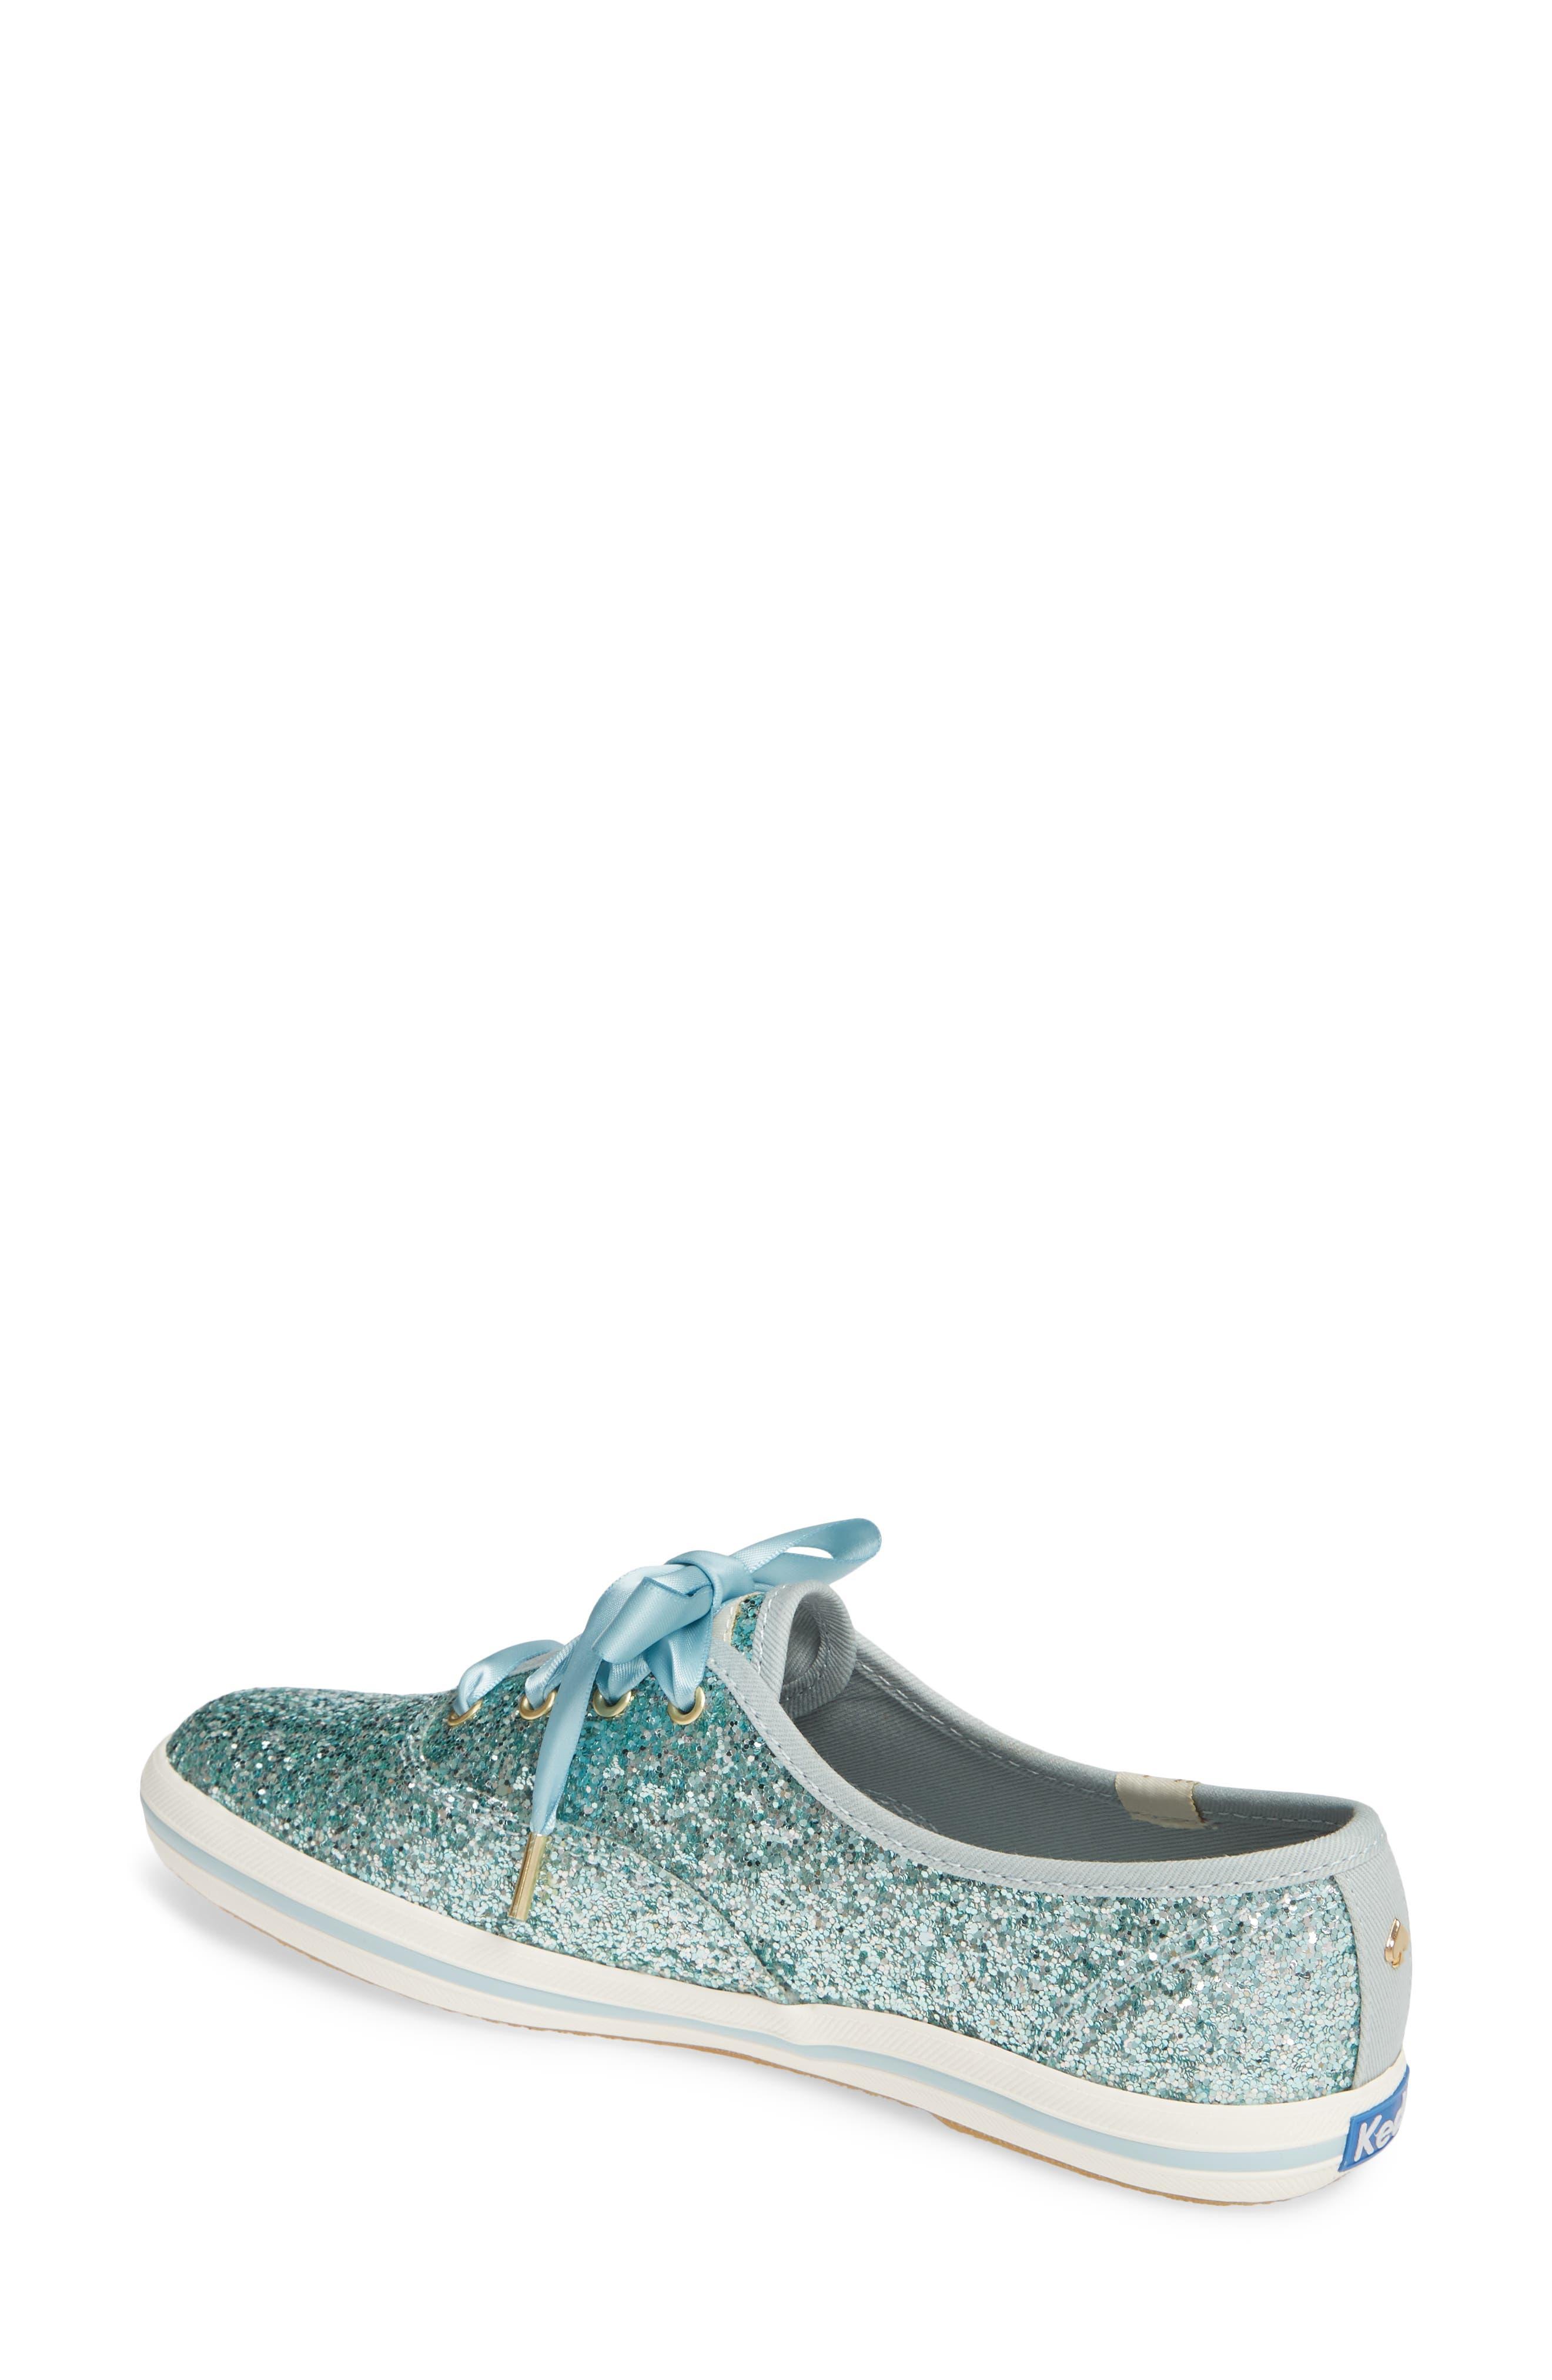 098dfa4de5e01 glitter shoes   Nordstrom